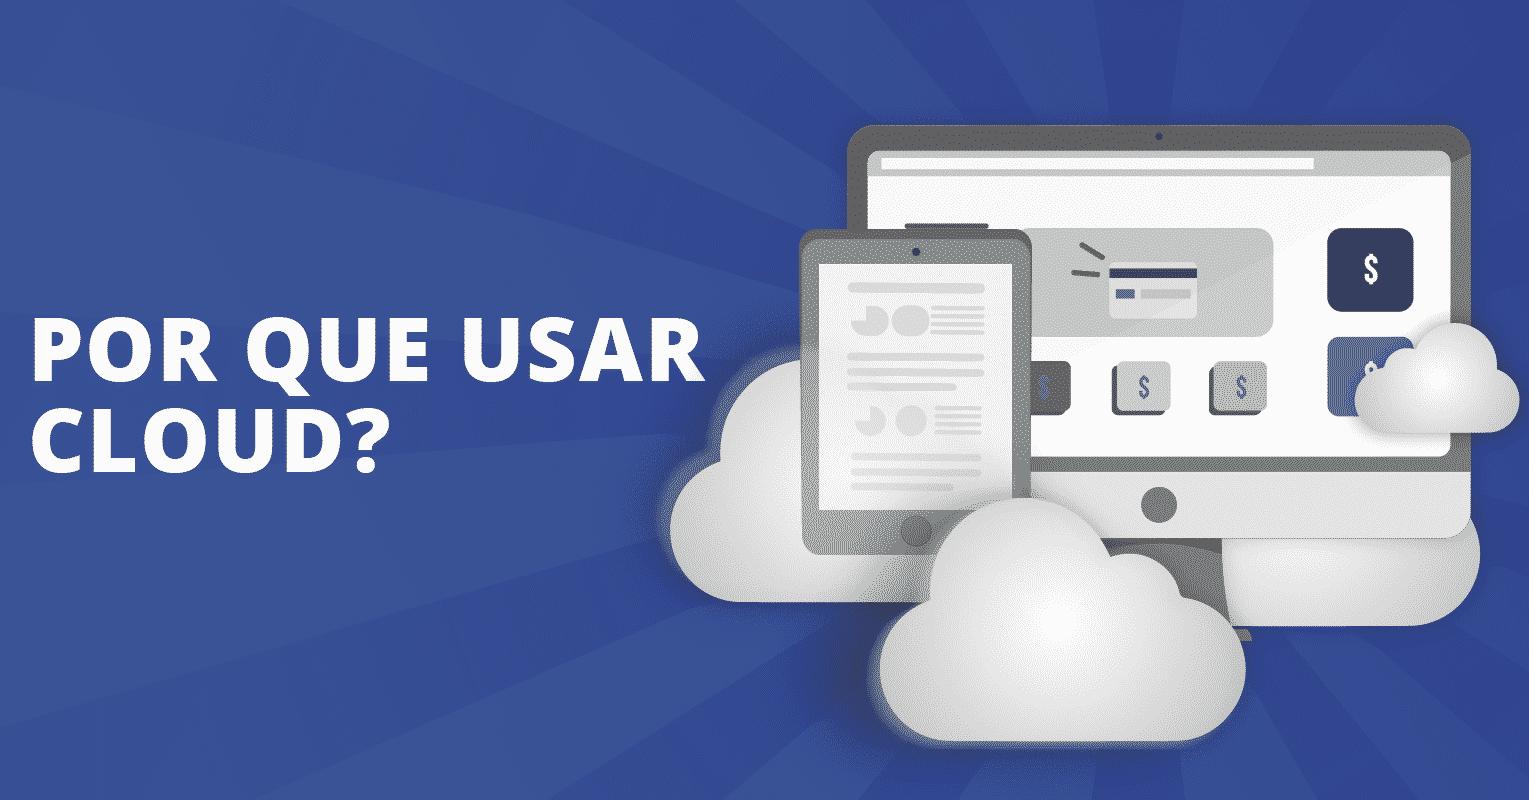 Por que usar cloud?